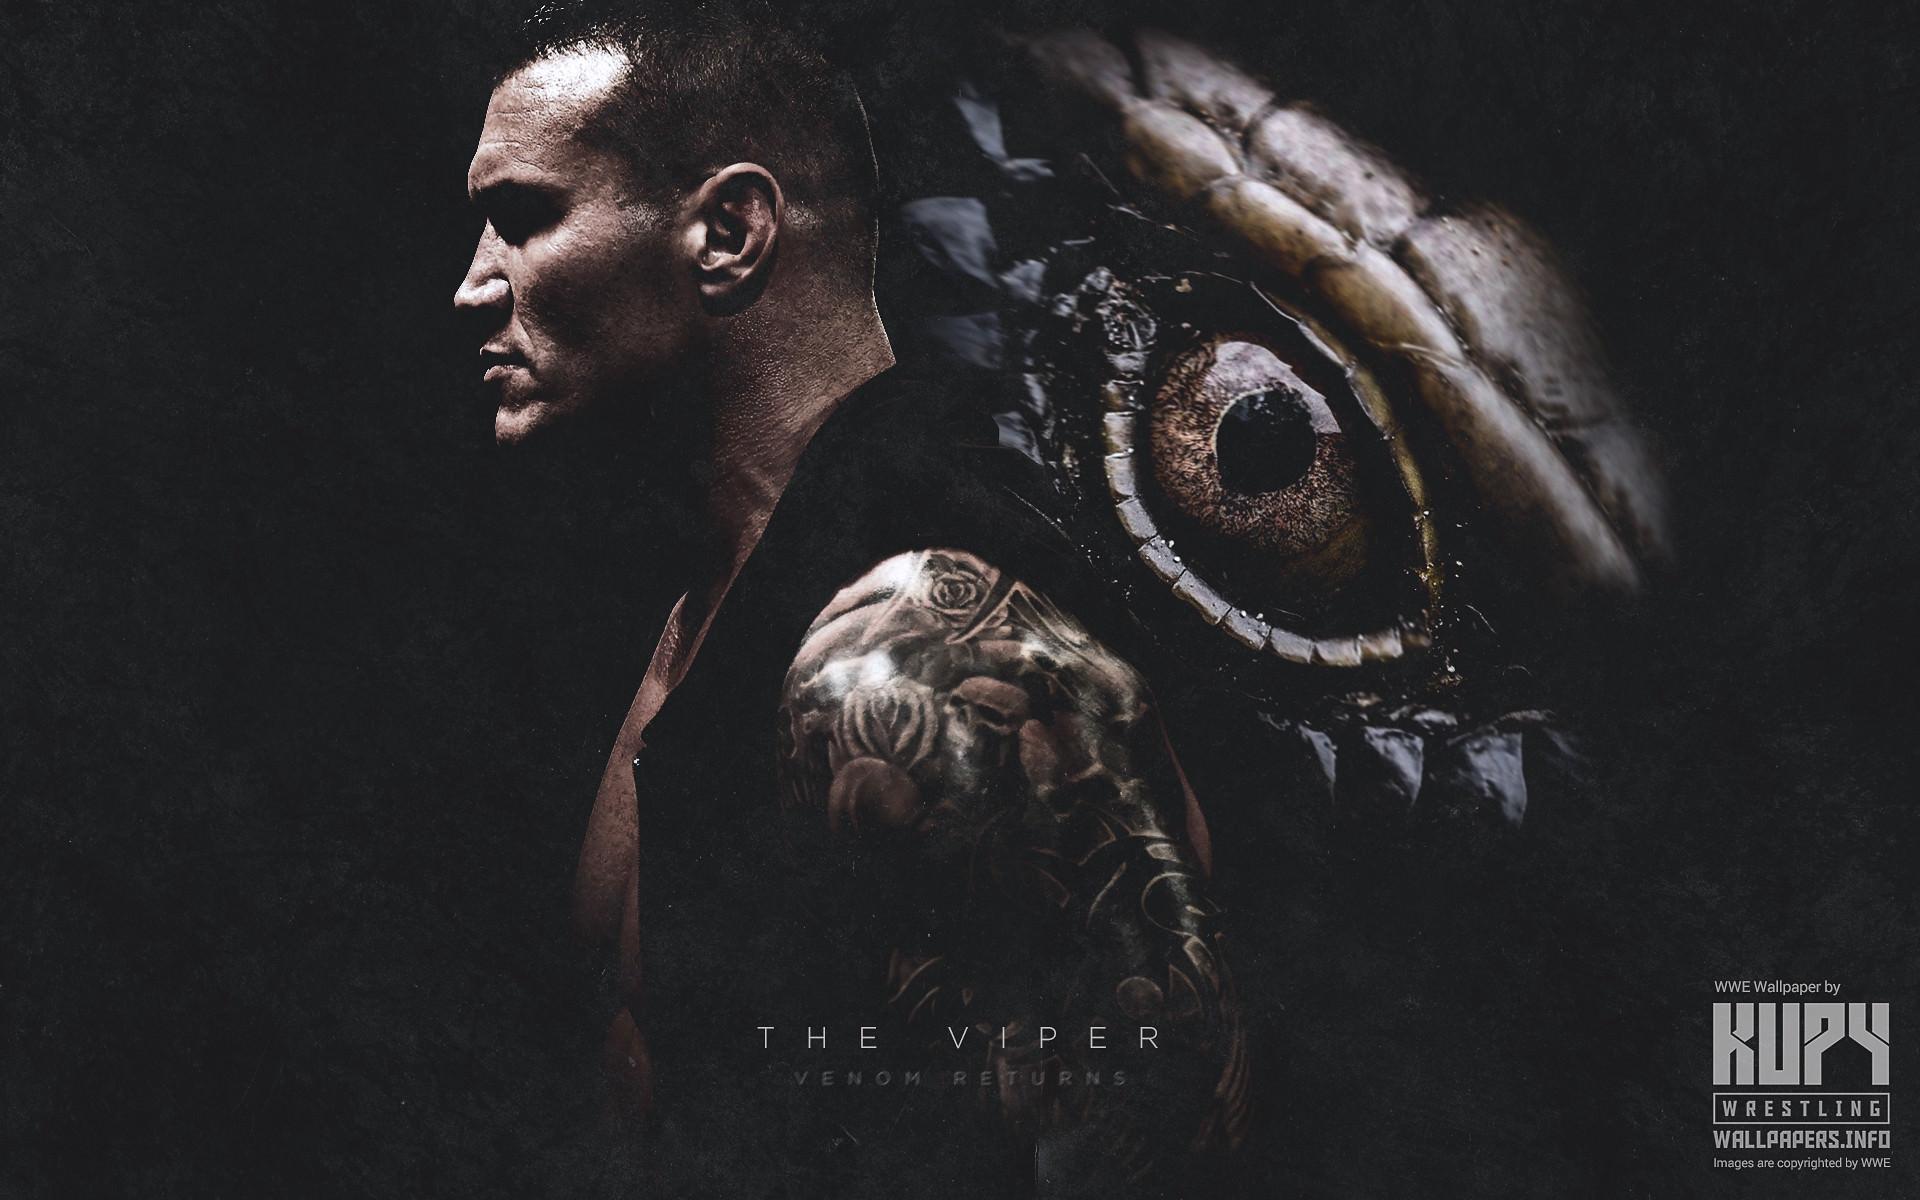 Randy Orton 2019 Wallpapers - Wallpaper Cave